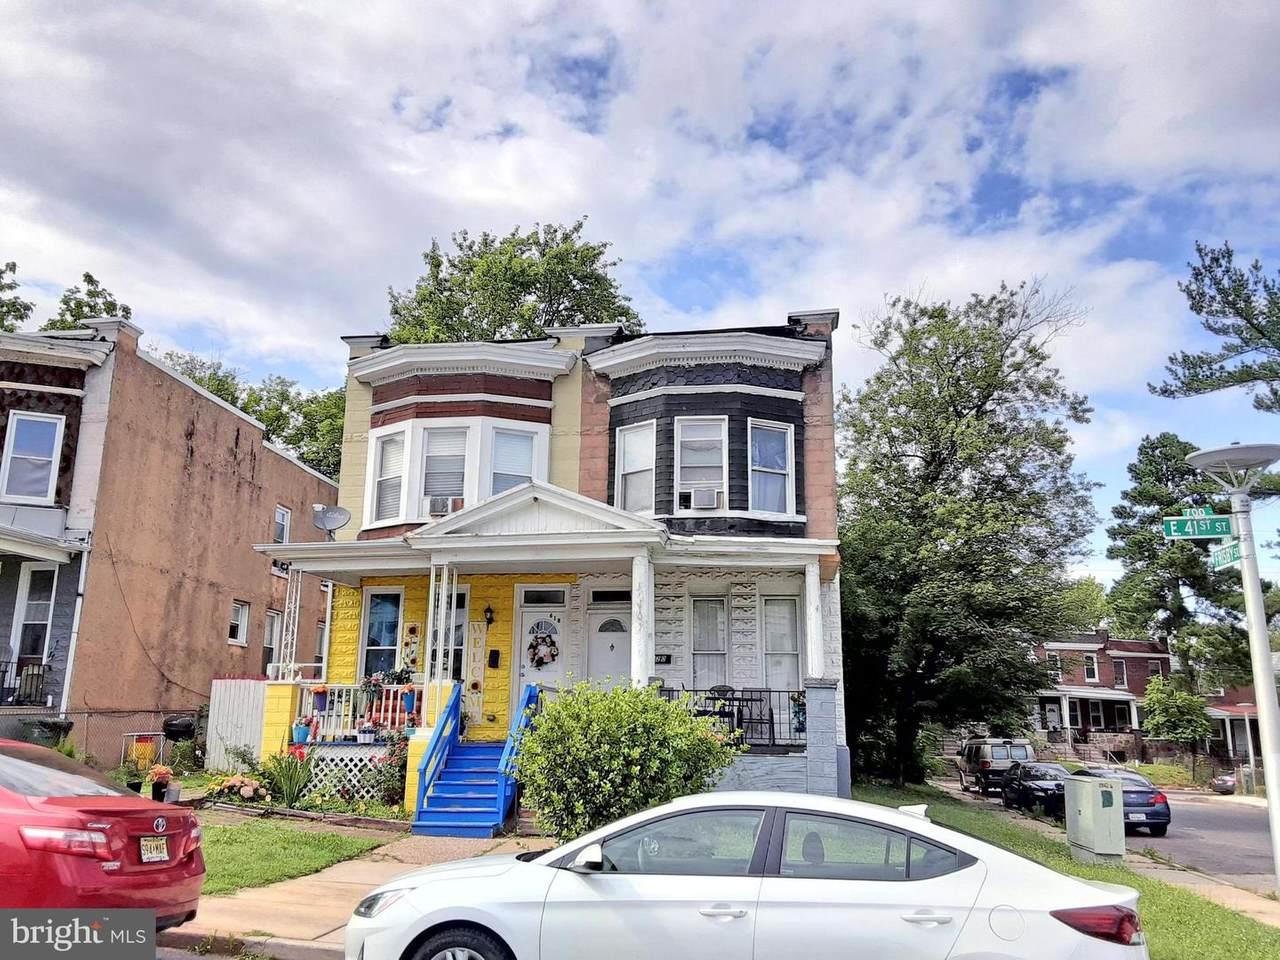 620 41ST Street - Photo 1